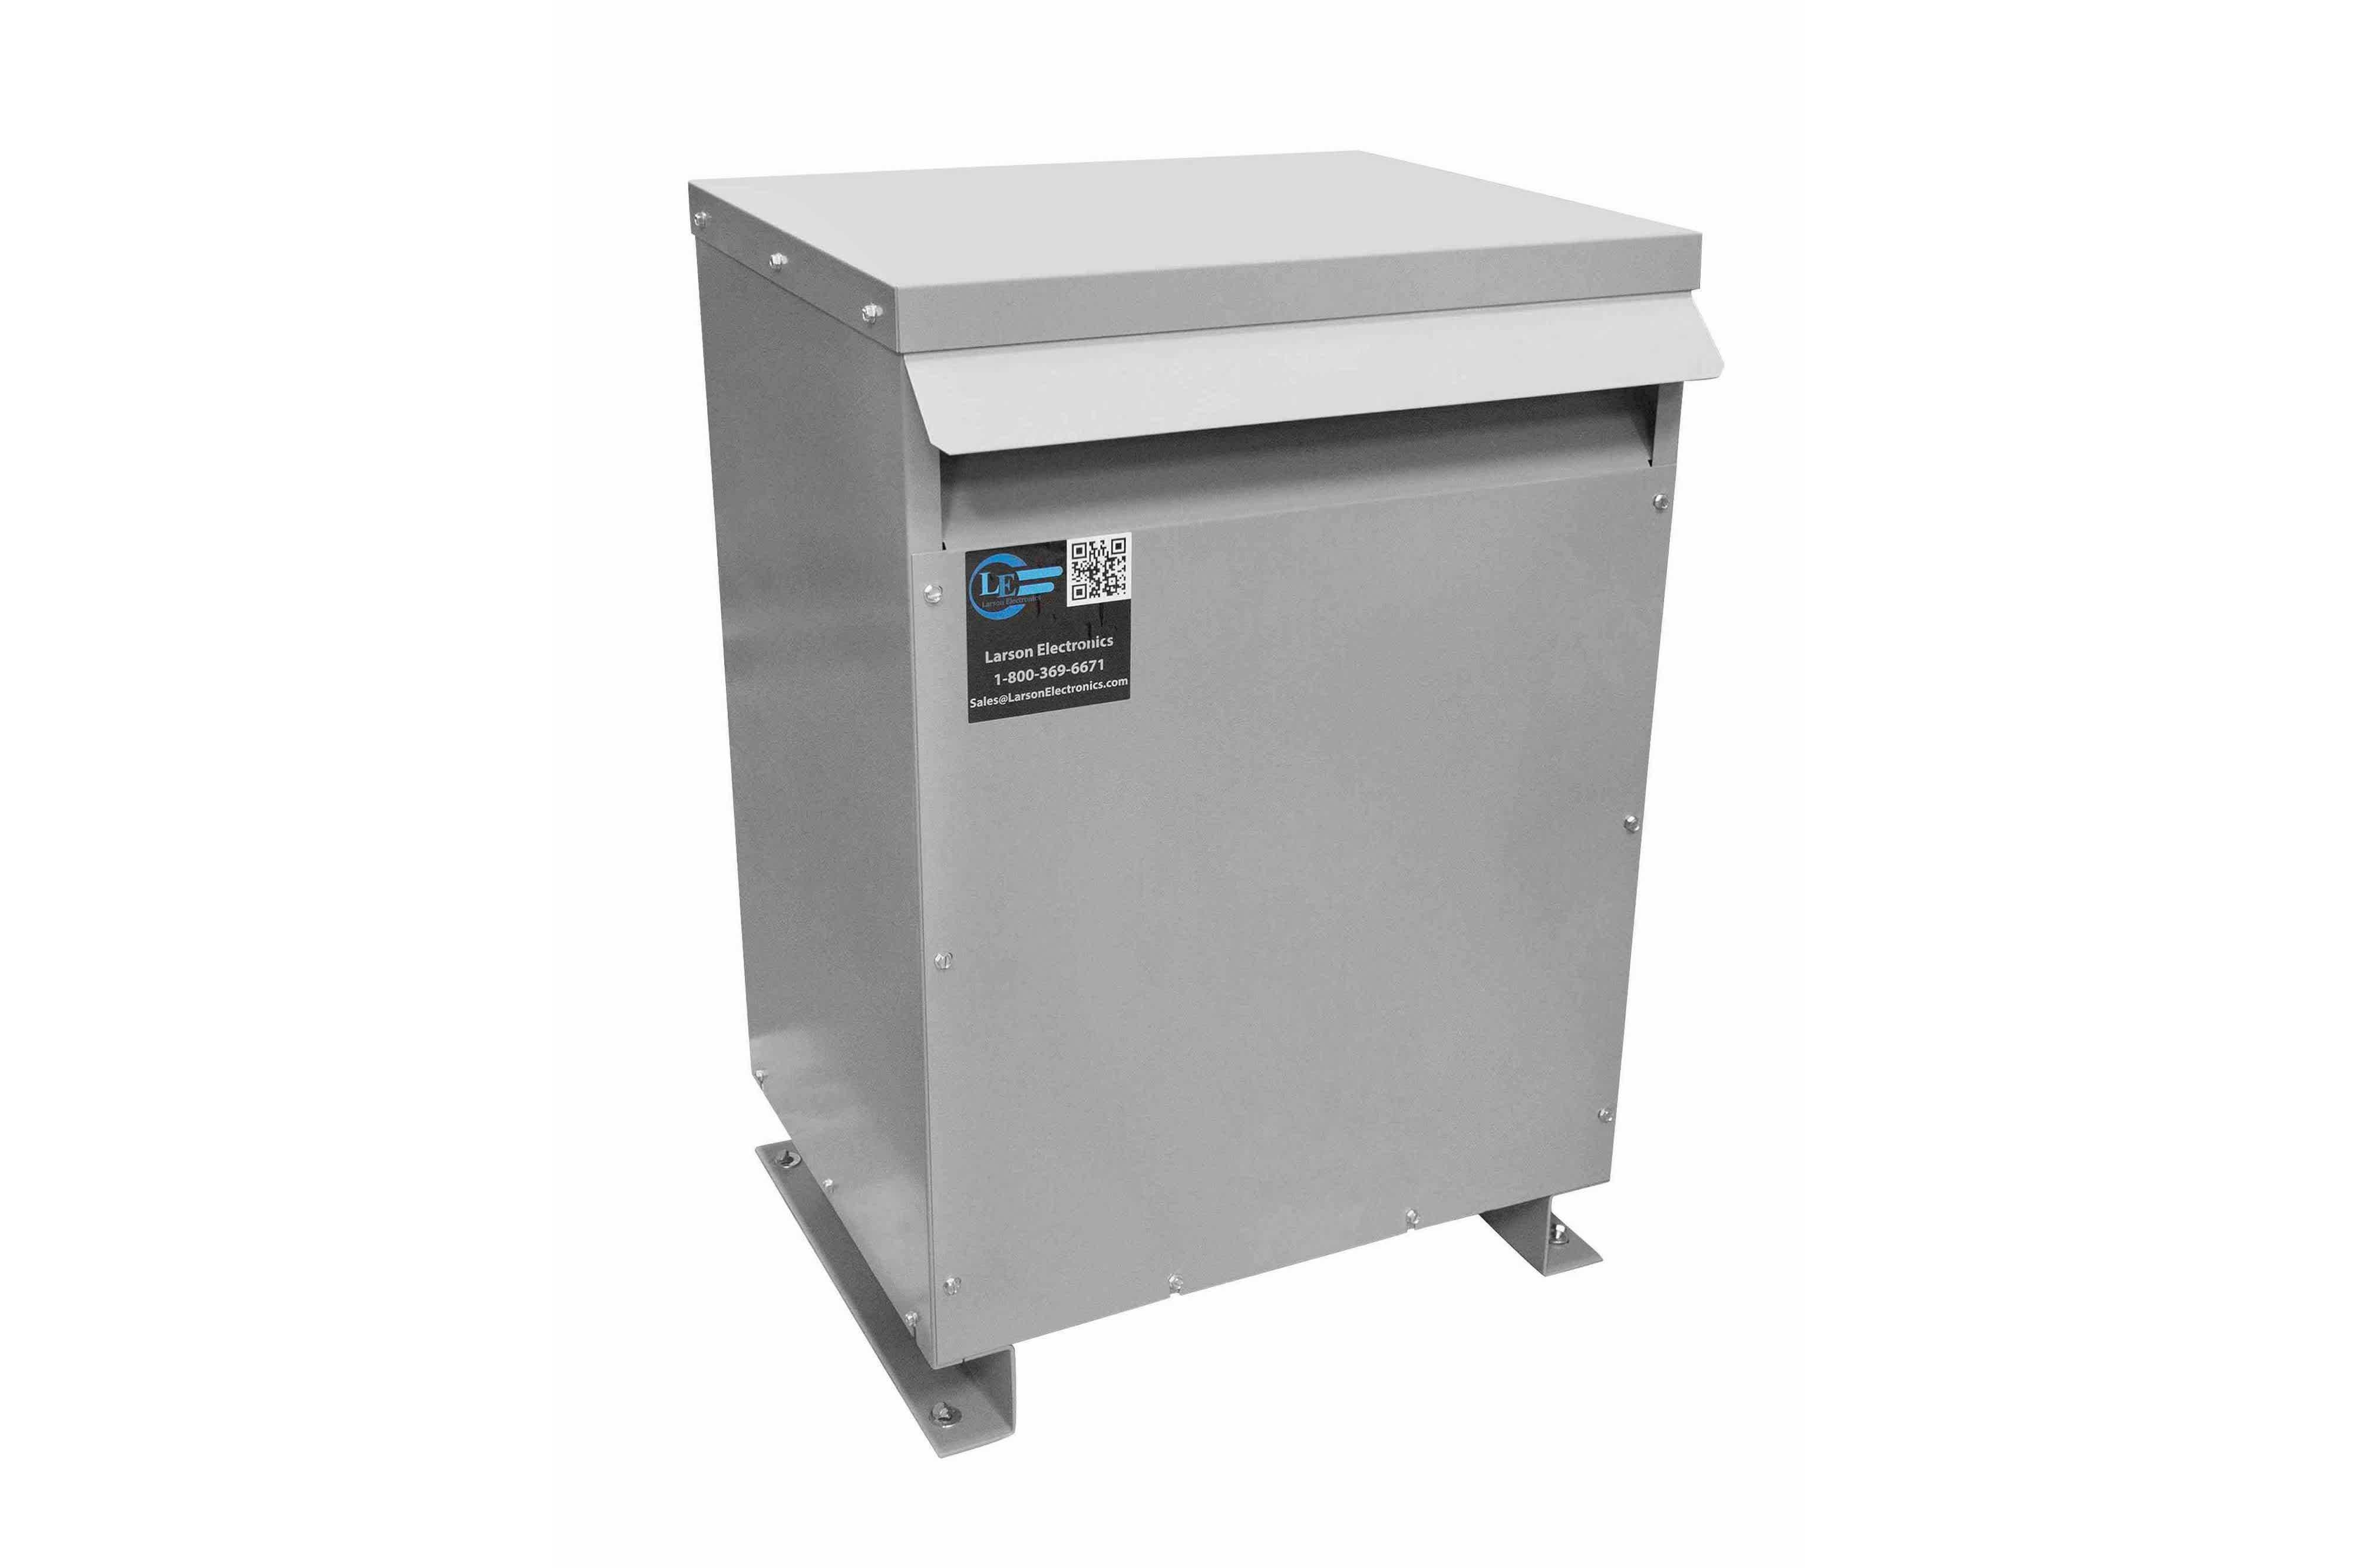 18 kVA 3PH Isolation Transformer, 240V Wye Primary, 415V Delta Secondary, N3R, Ventilated, 60 Hz